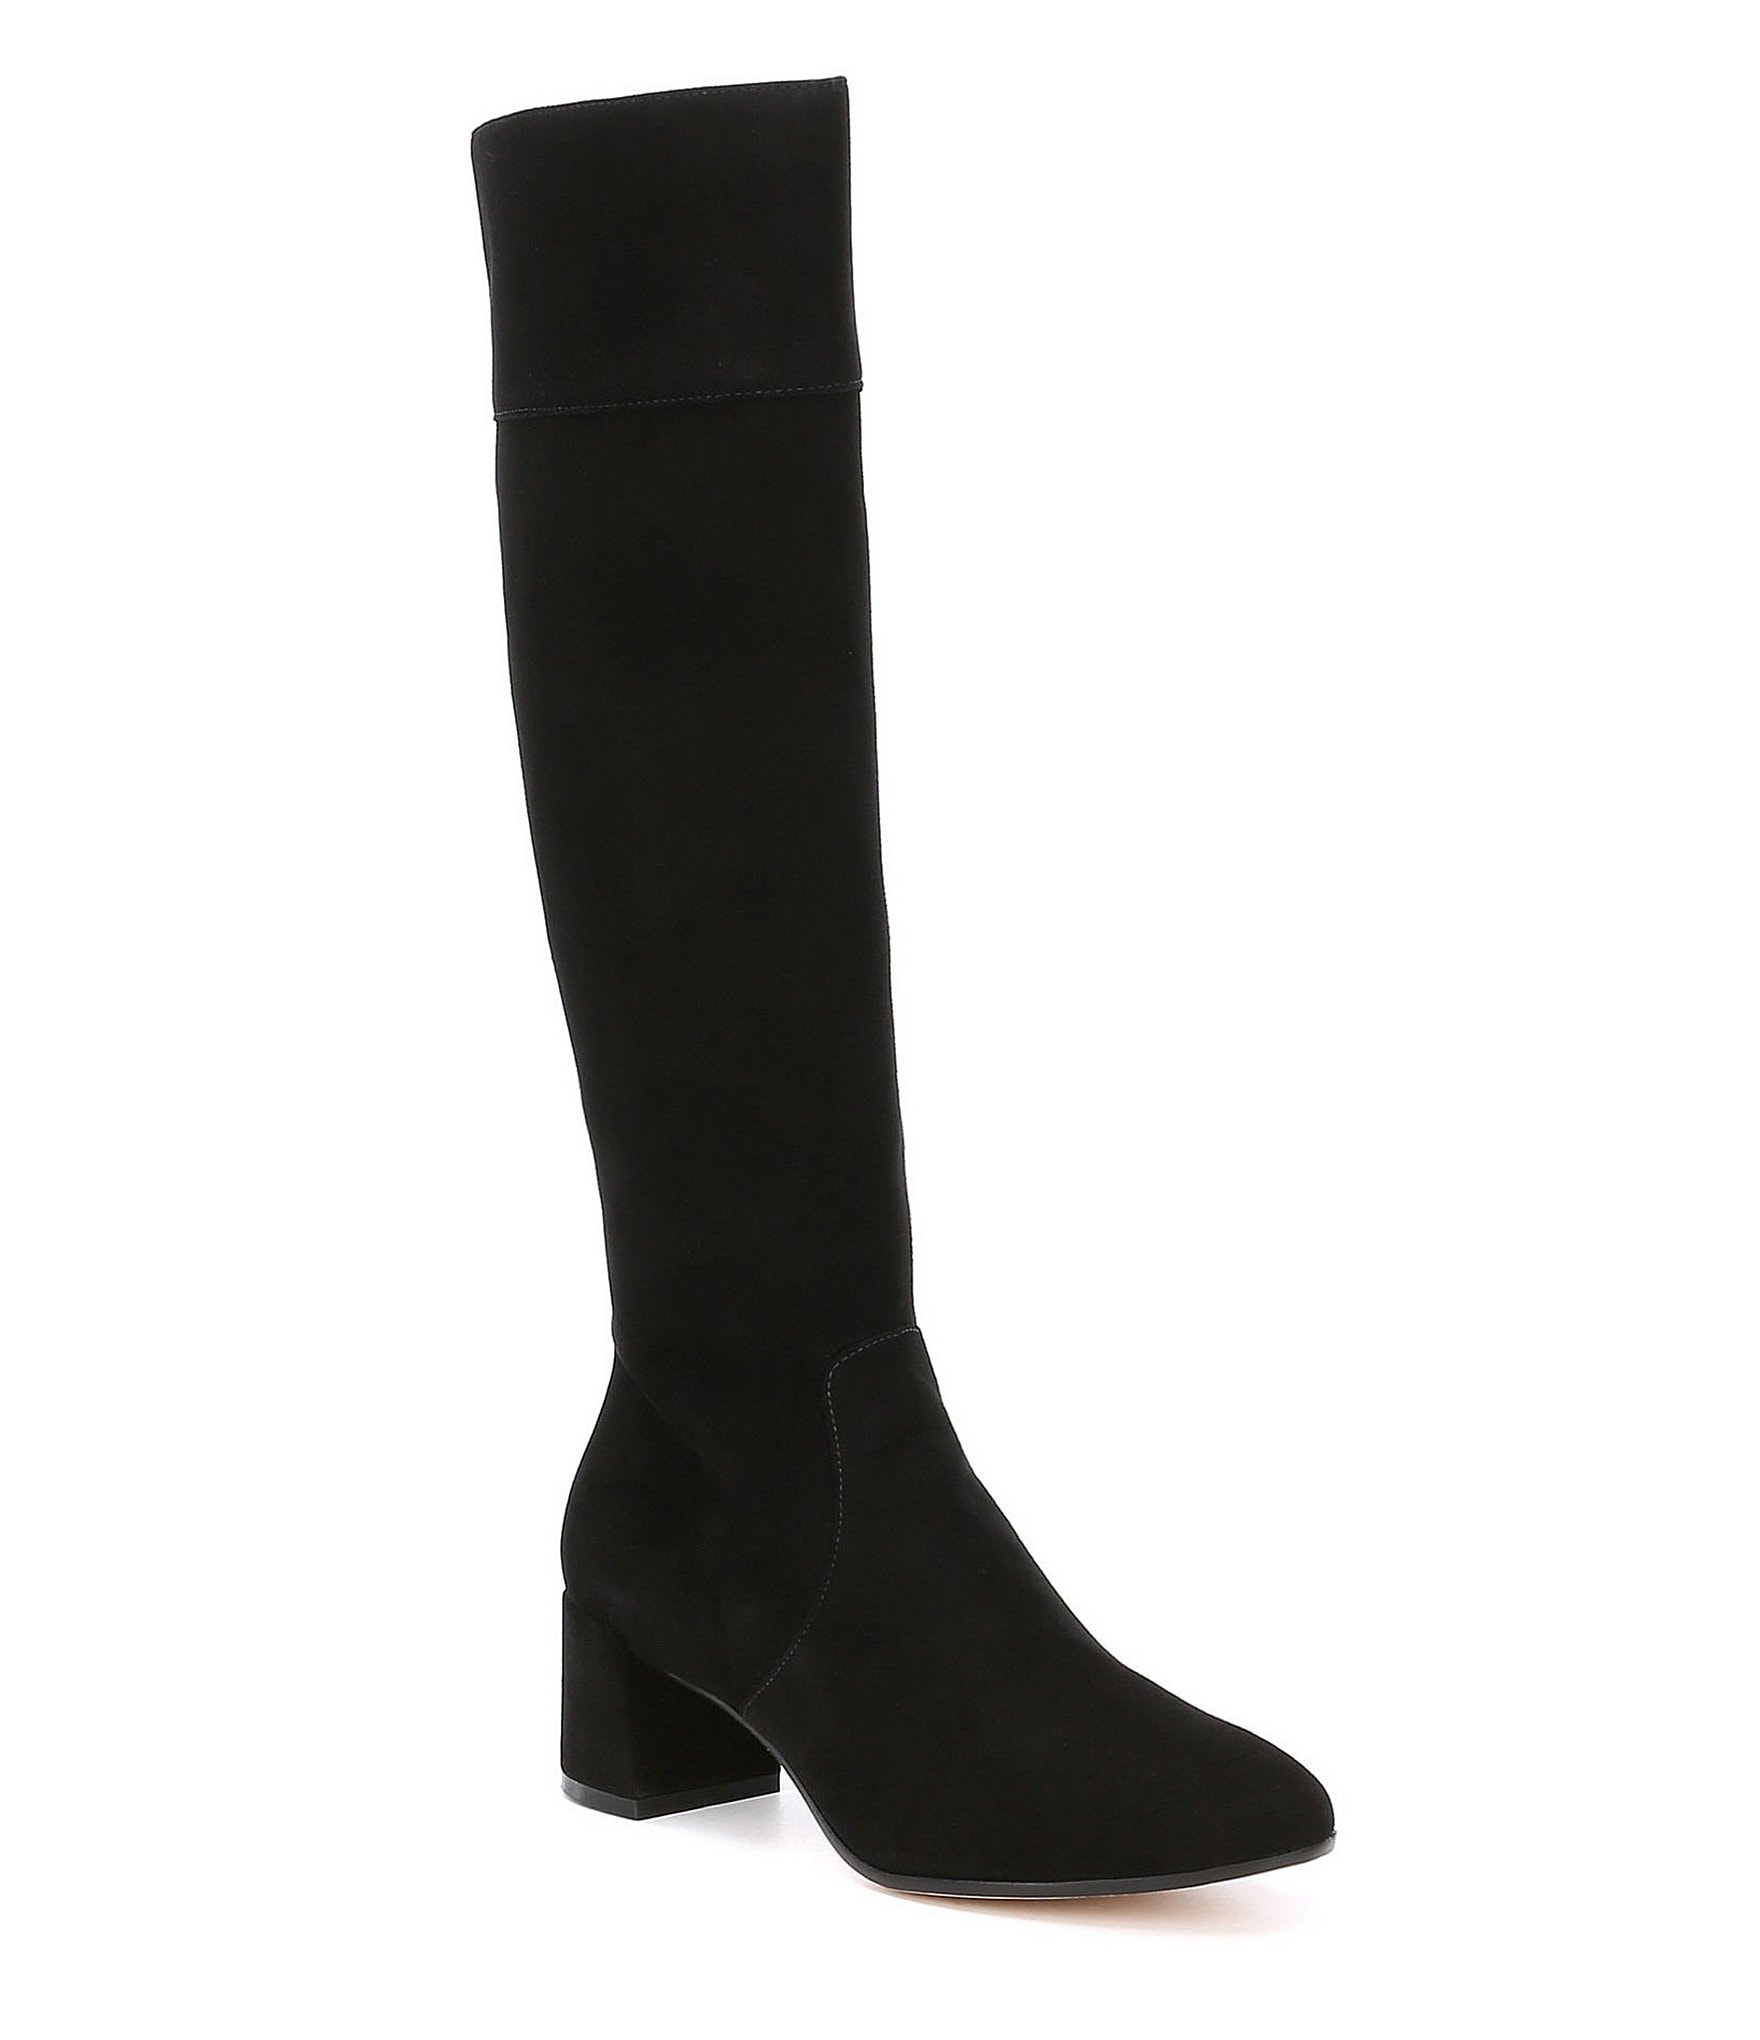 antonio melani parsenass kidsuede narrow calf dress boots